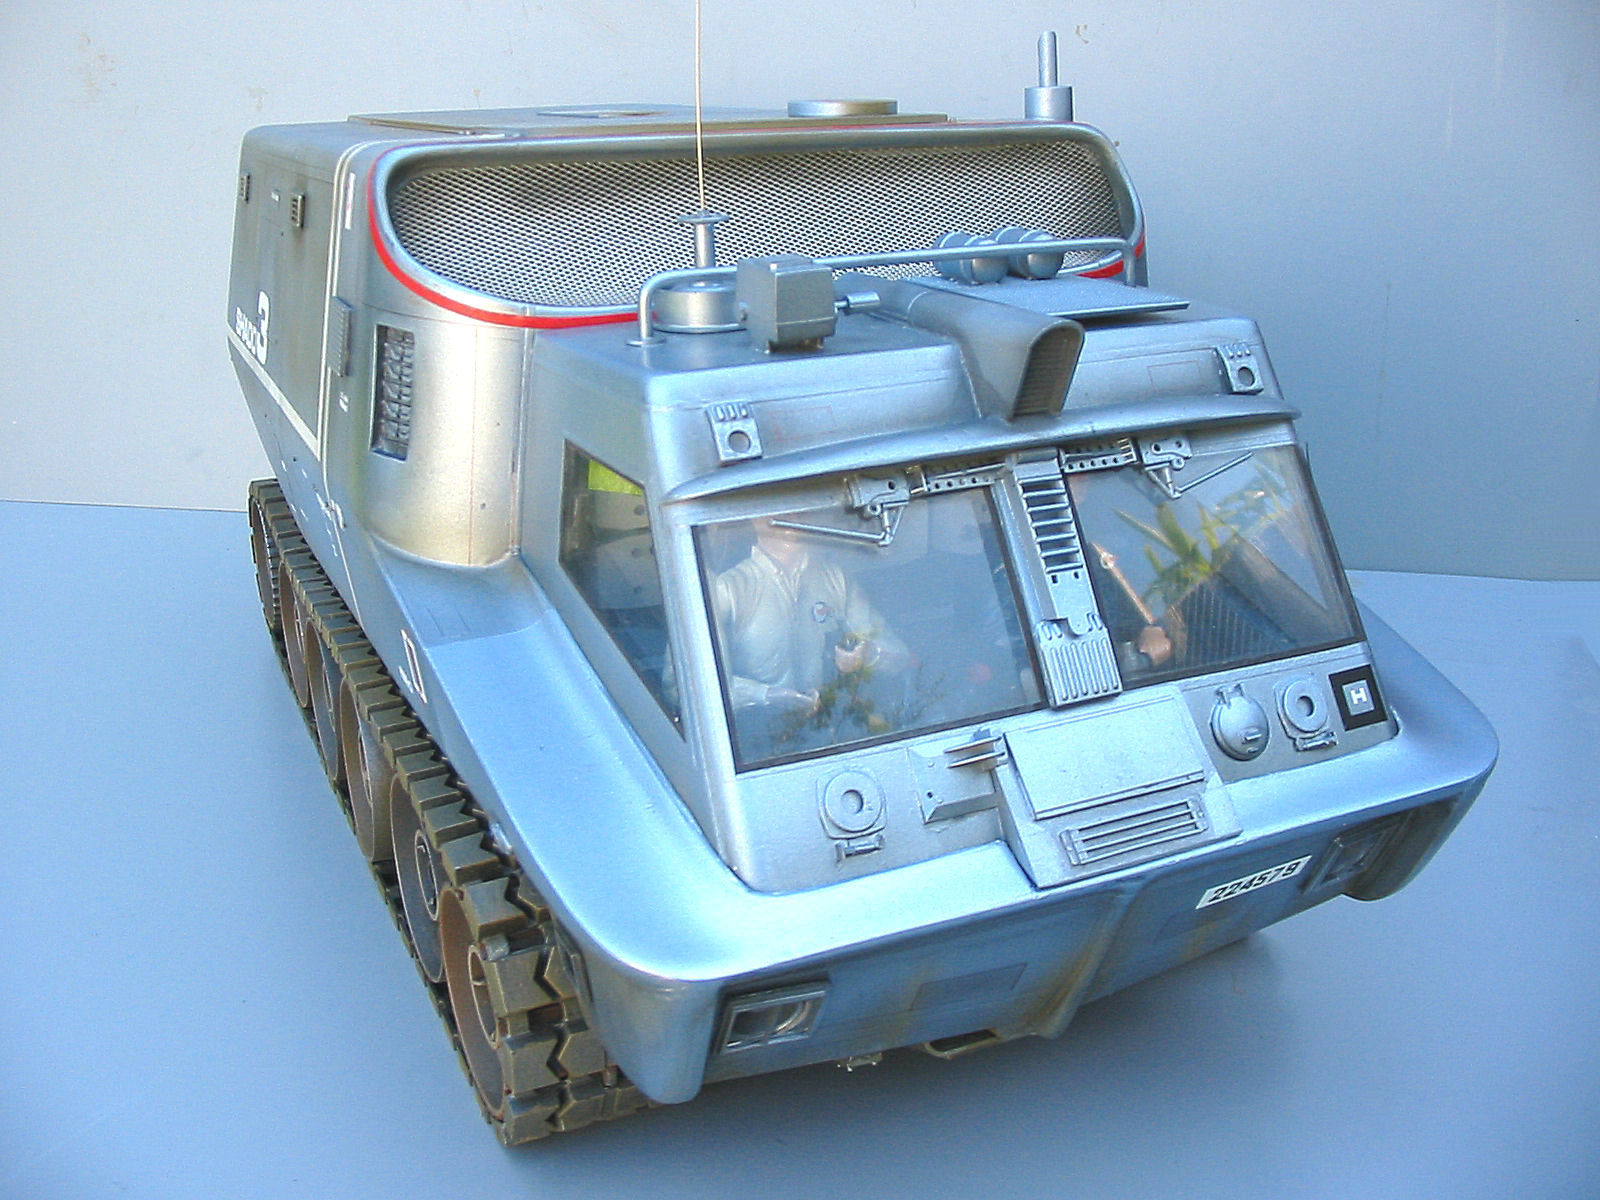 SHADO MOBILE 15